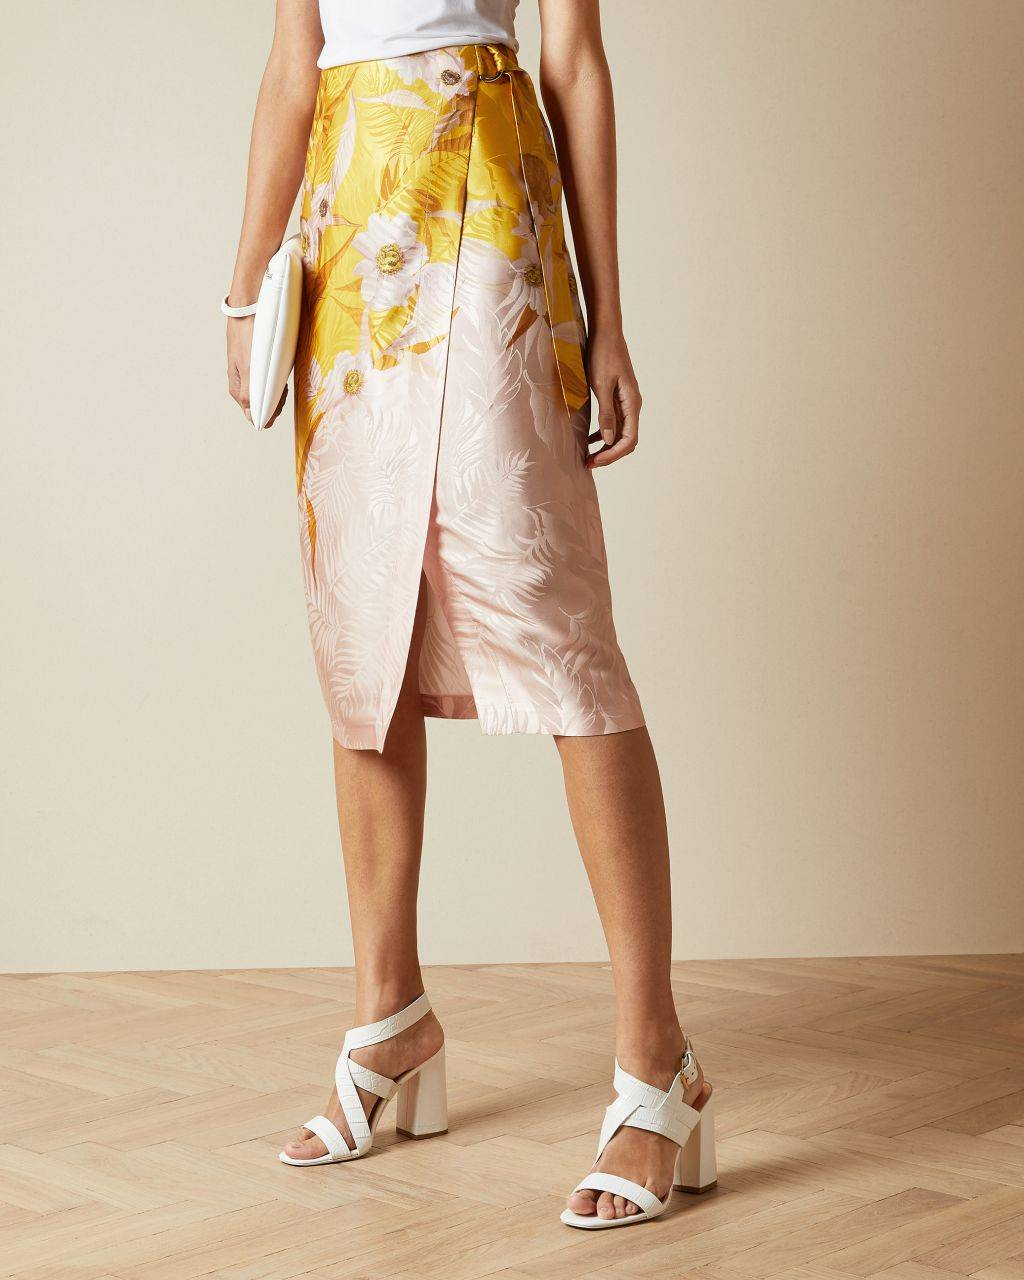 Ted Baker Cabana Printed Wrap Skirt  - Yellow - Size:  4 (UK 14)